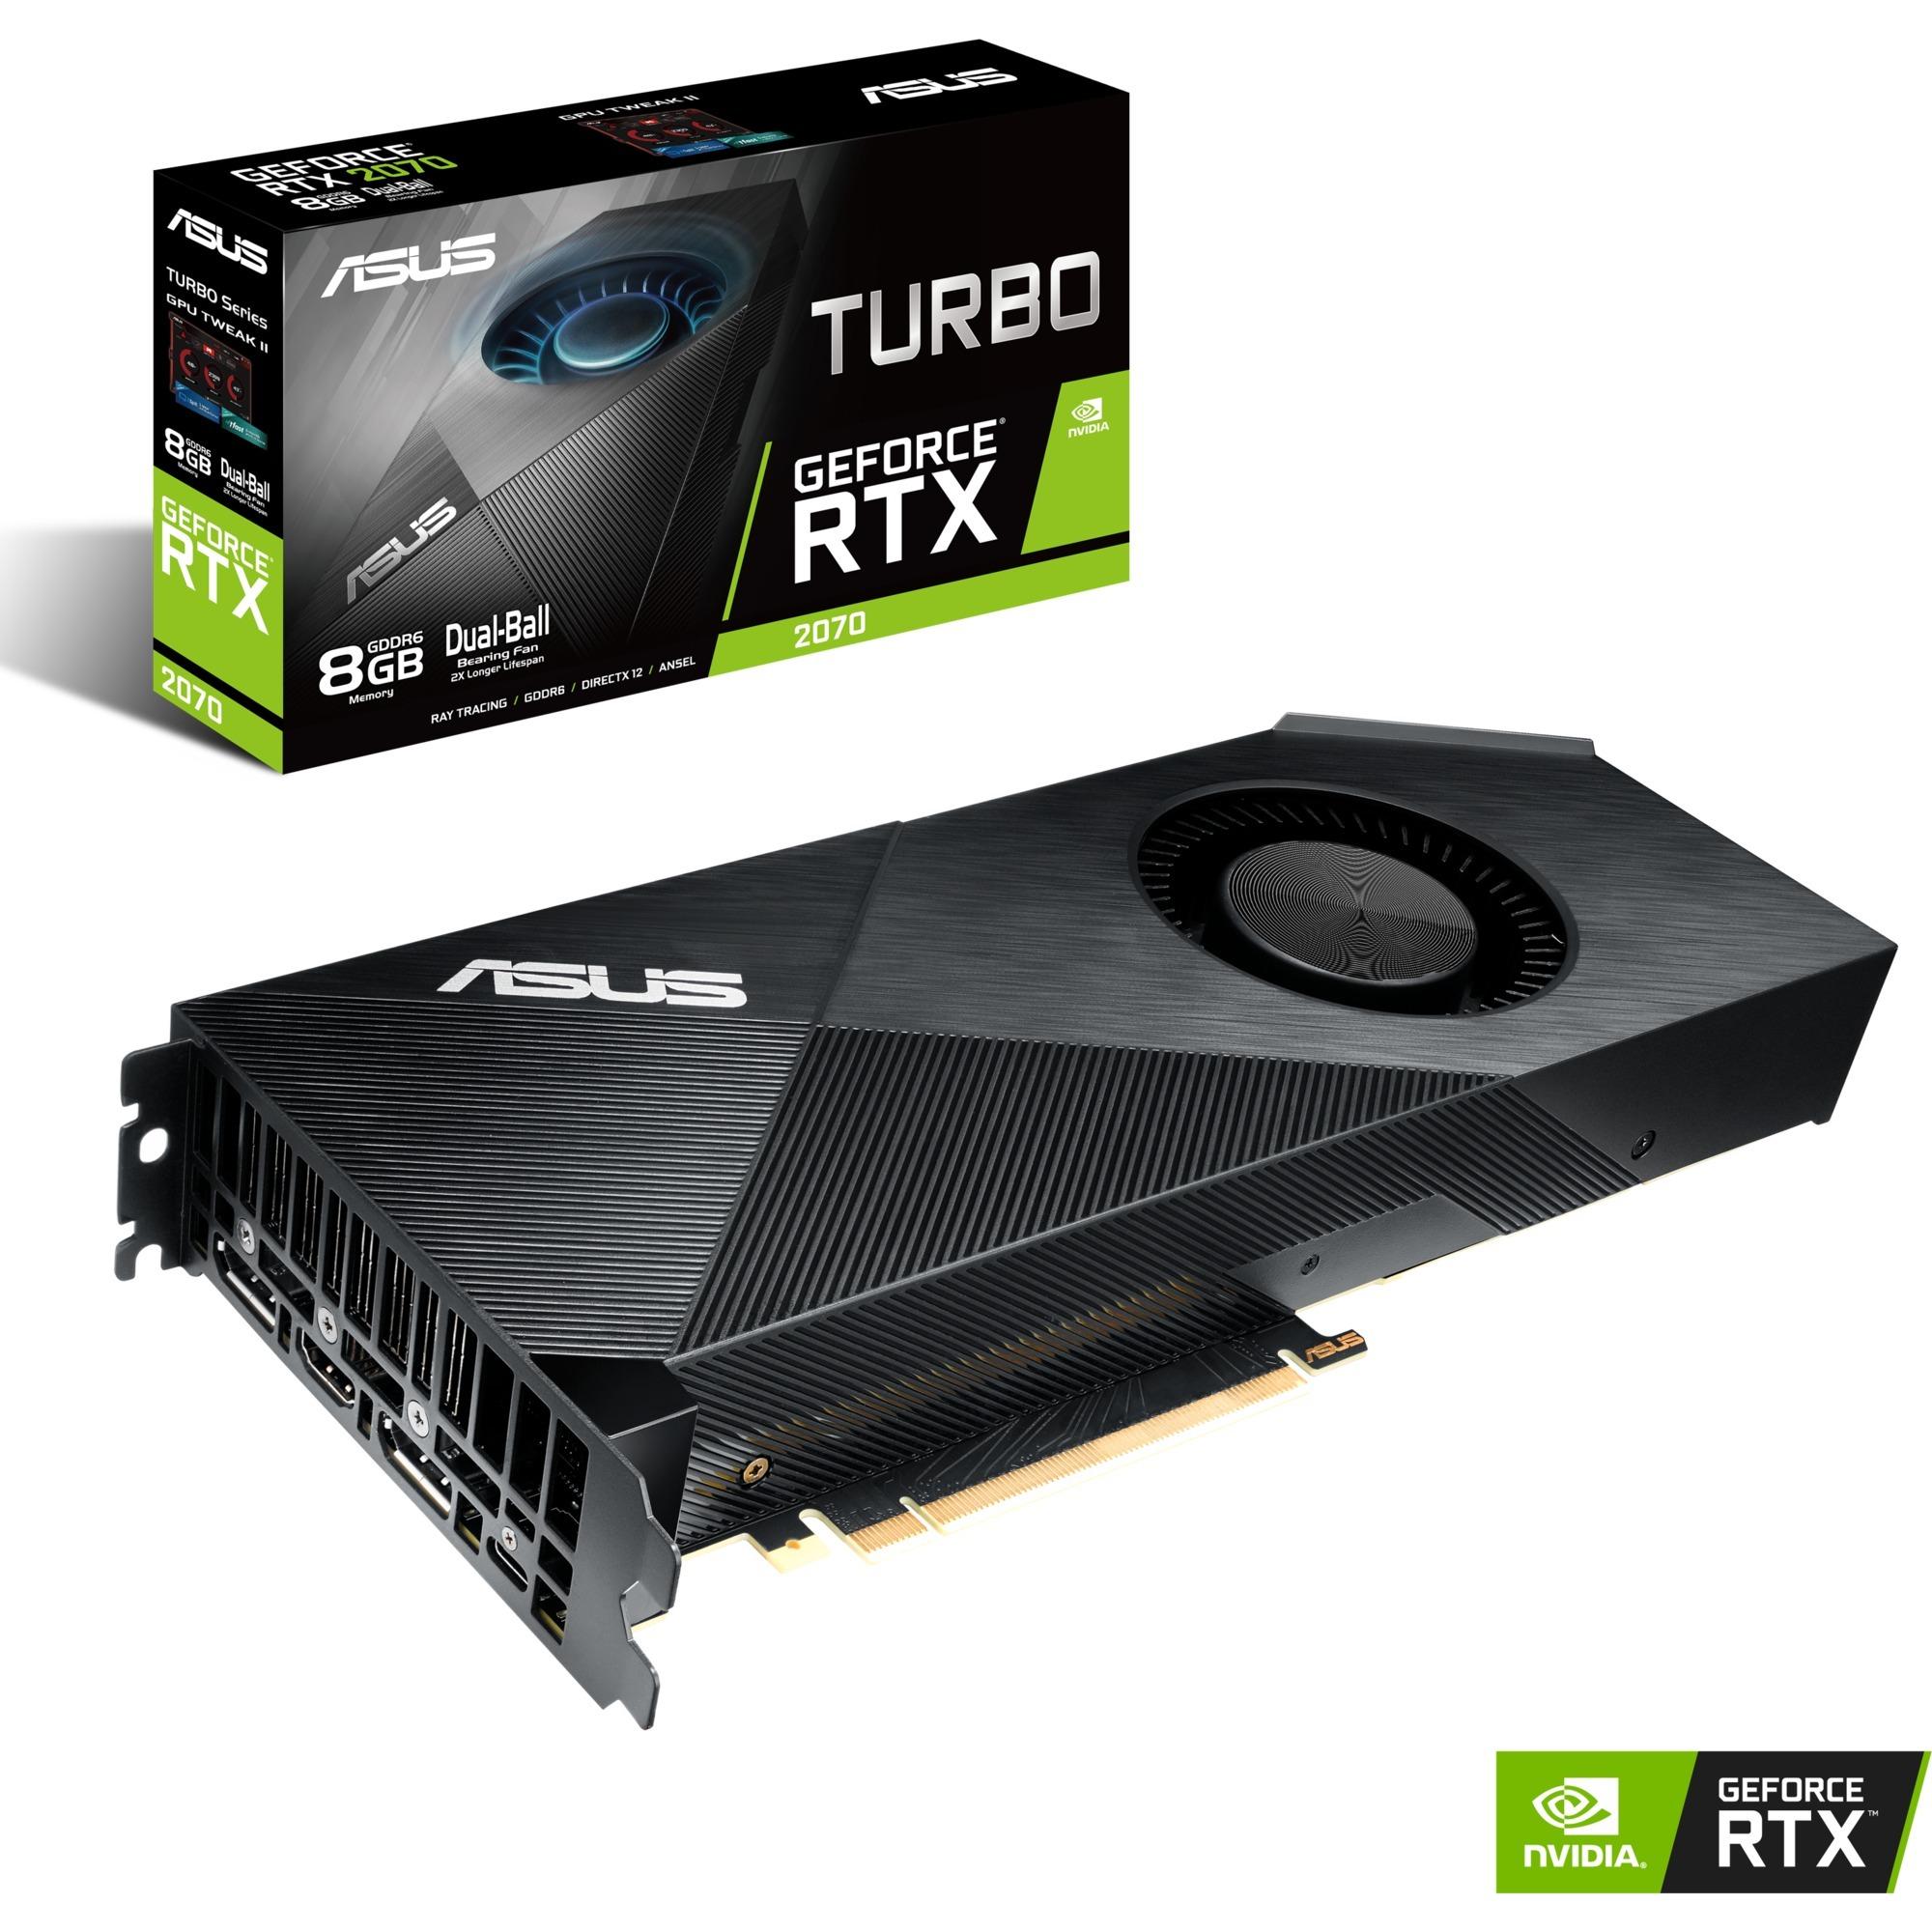 Turbo -RTX2070-8G-EVO GeForce RTX 2070 8 GB GDDR6, Scheda grafica